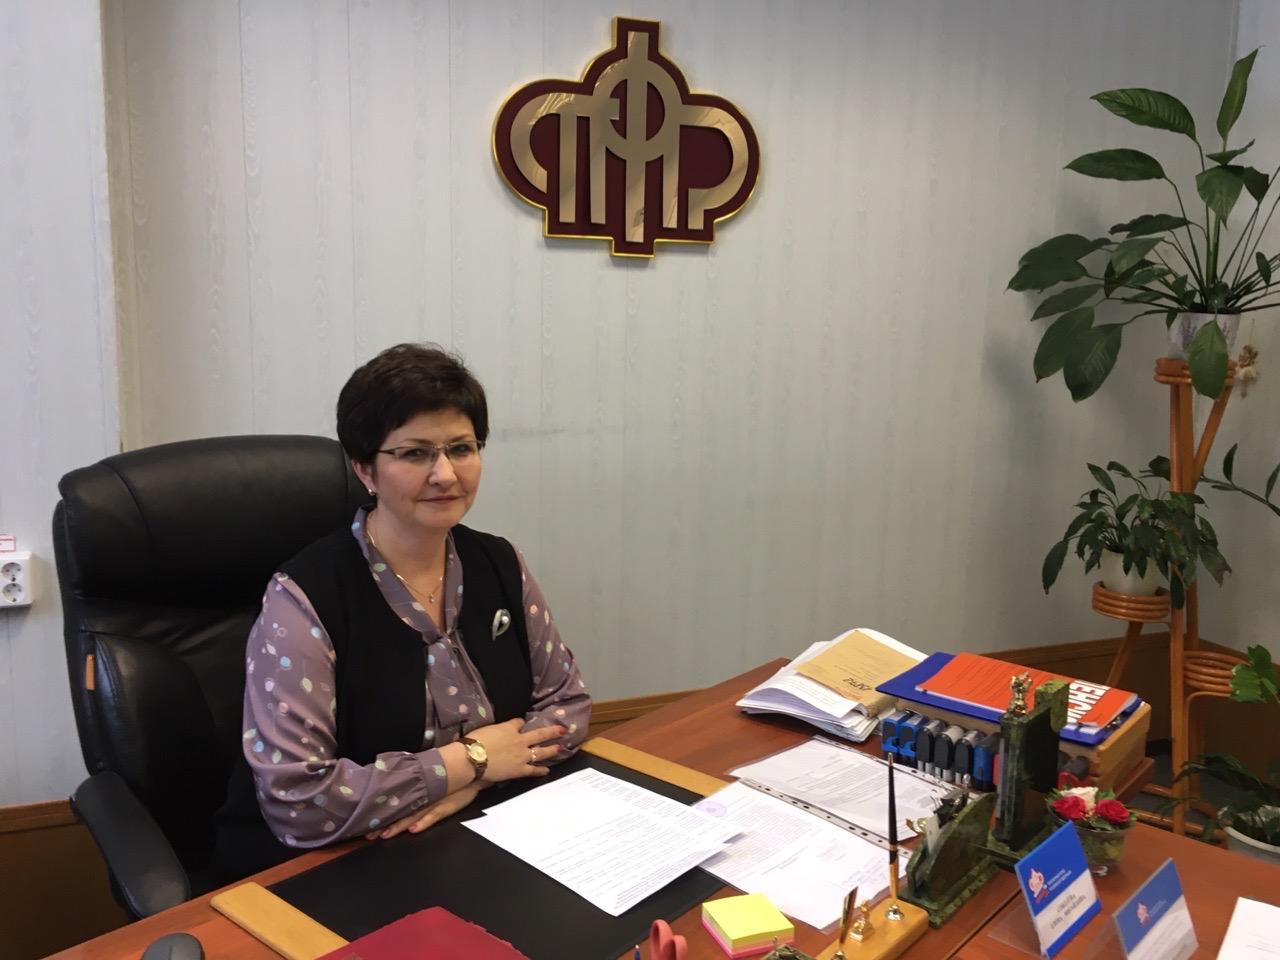 Пенсионный фонд юлия ермакова